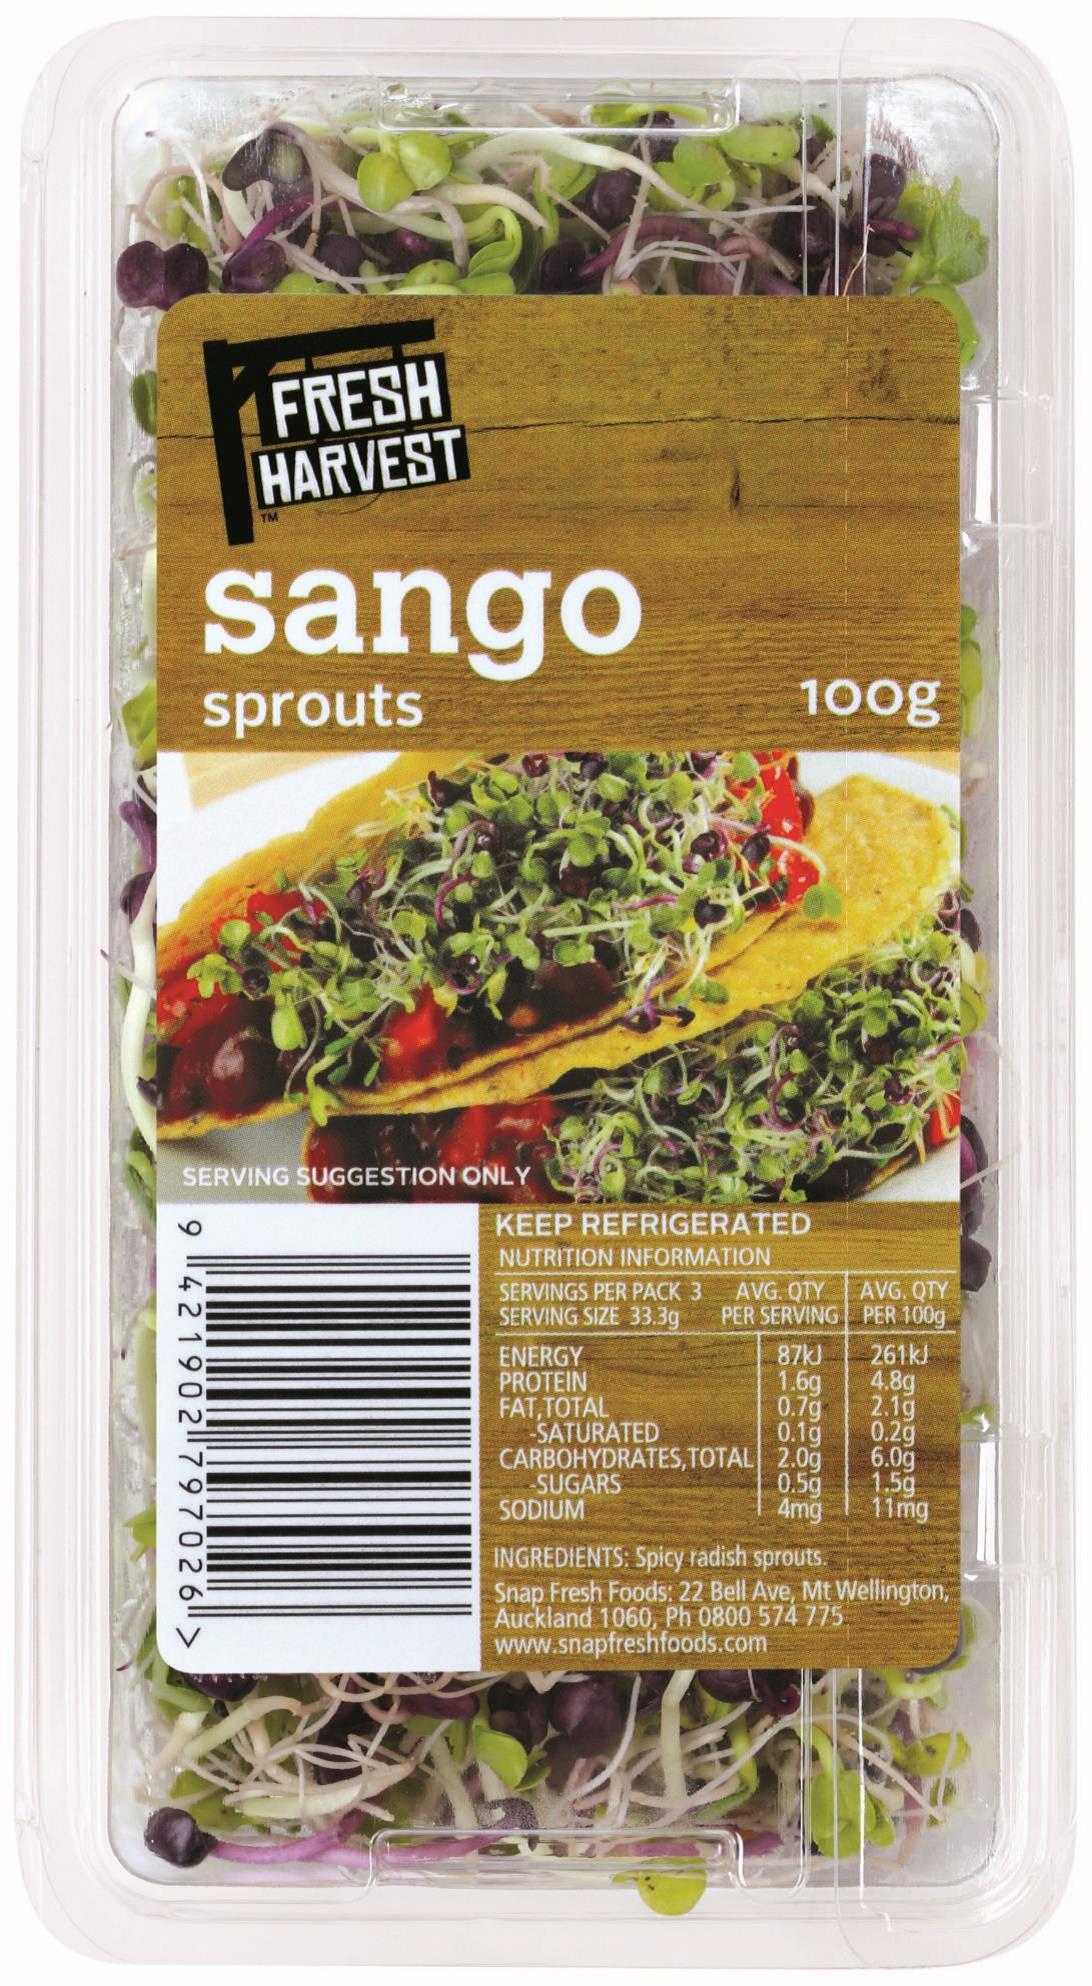 Fresh Harvest Sango Sprouts 100g